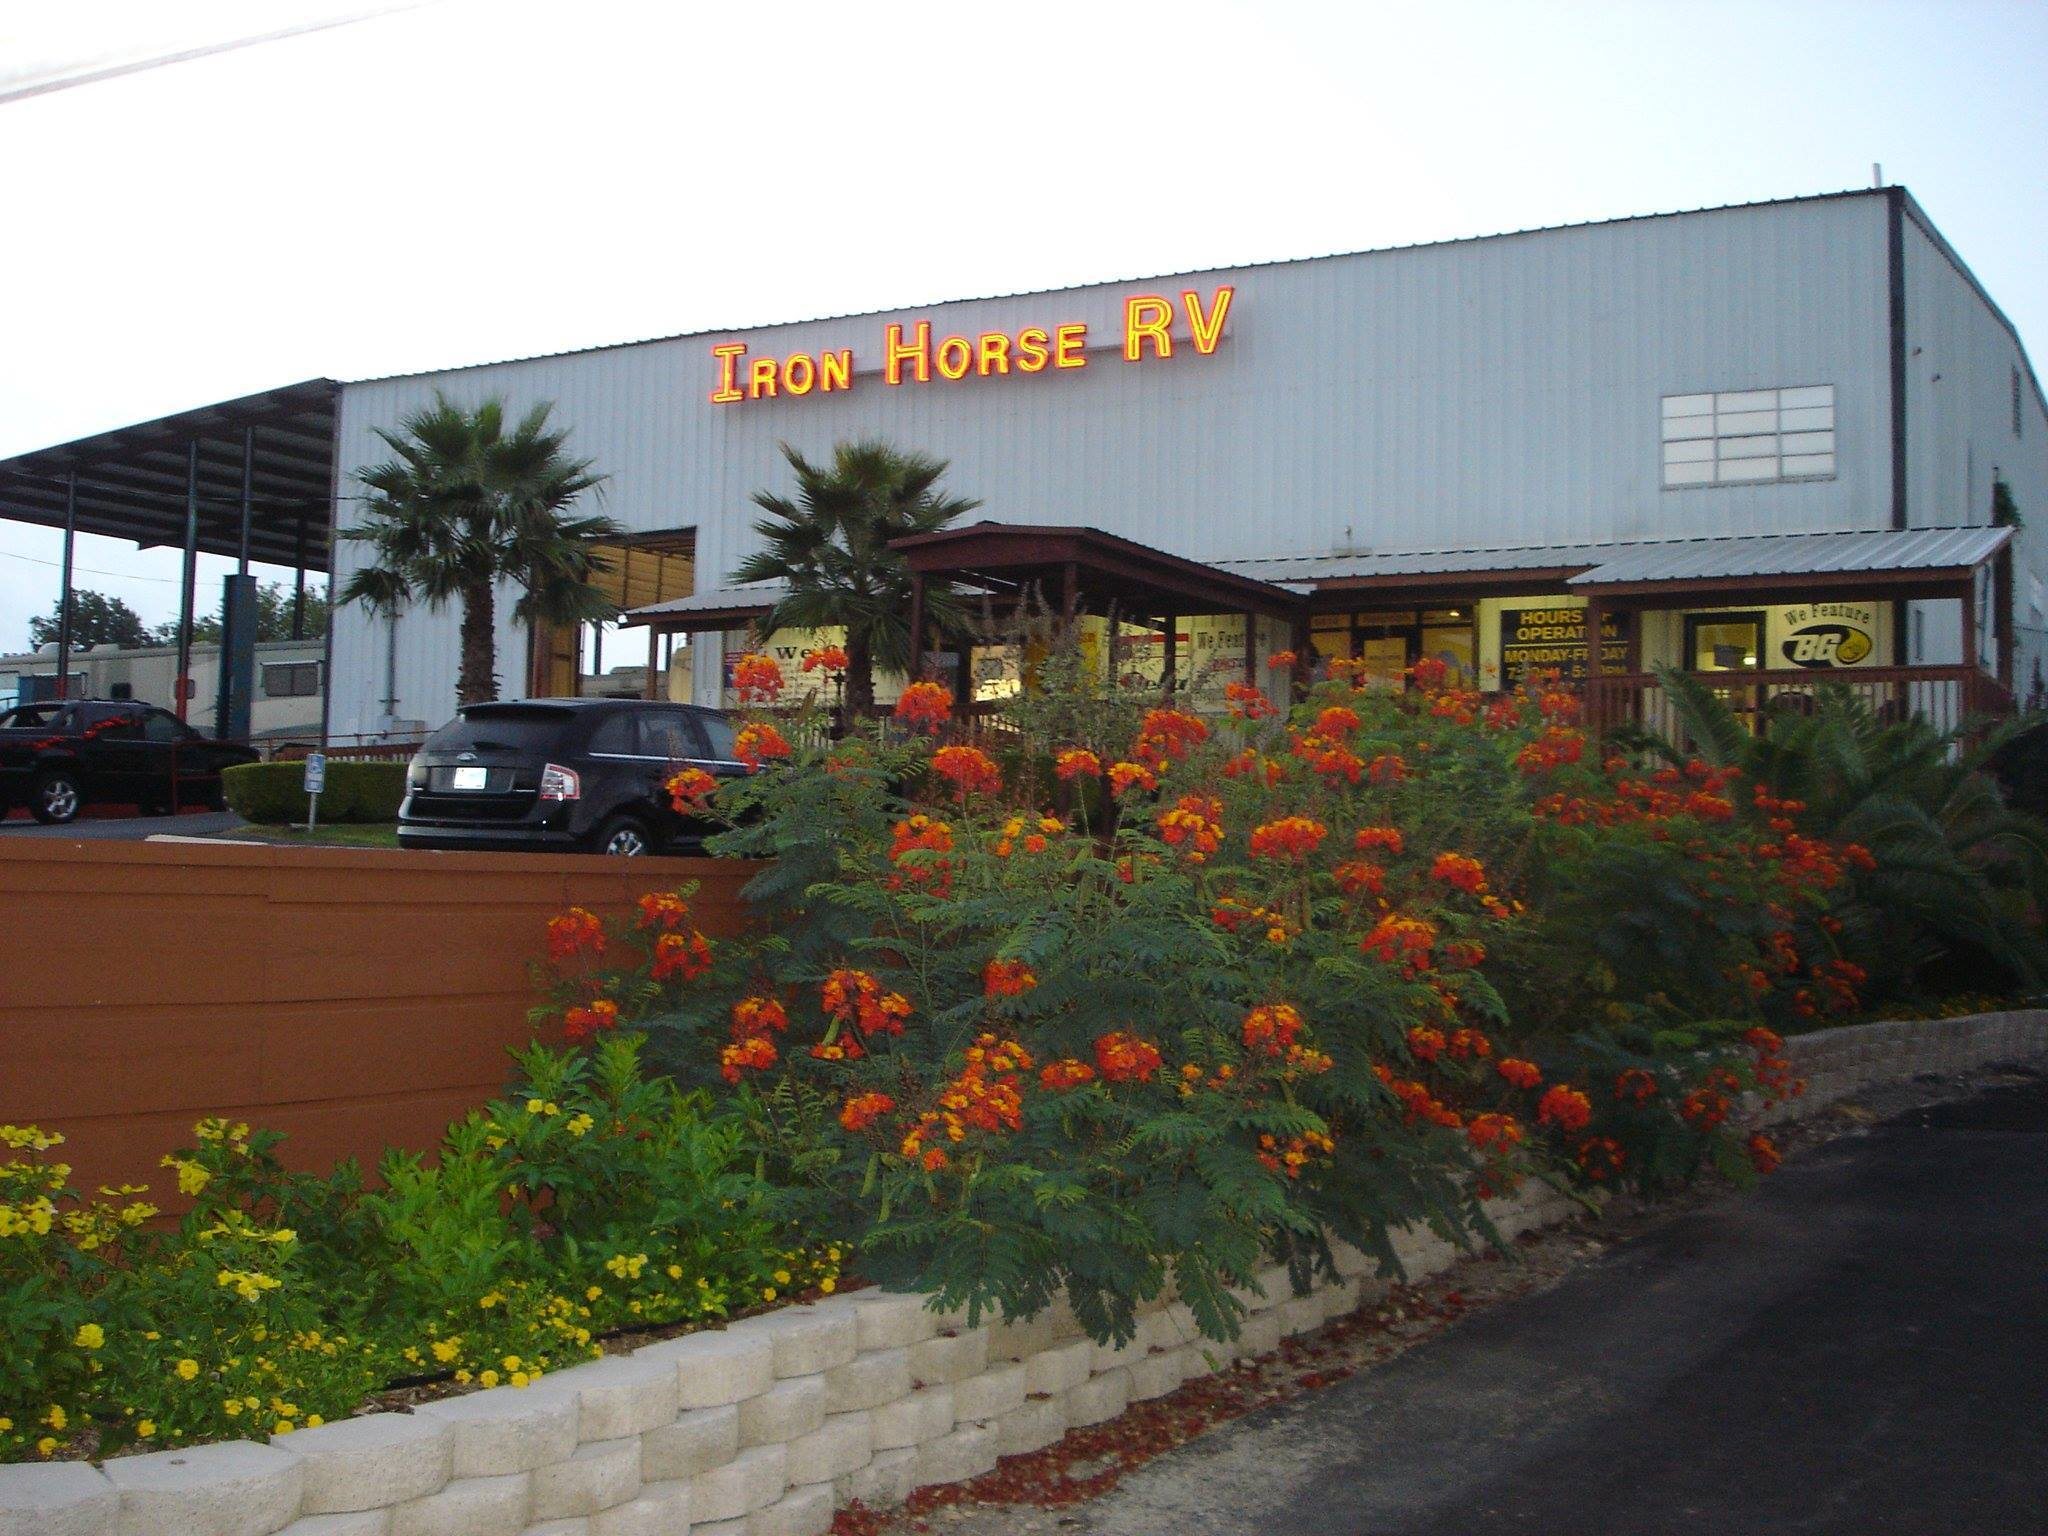 Iron Horse RV - San Antonio's RV Specialist